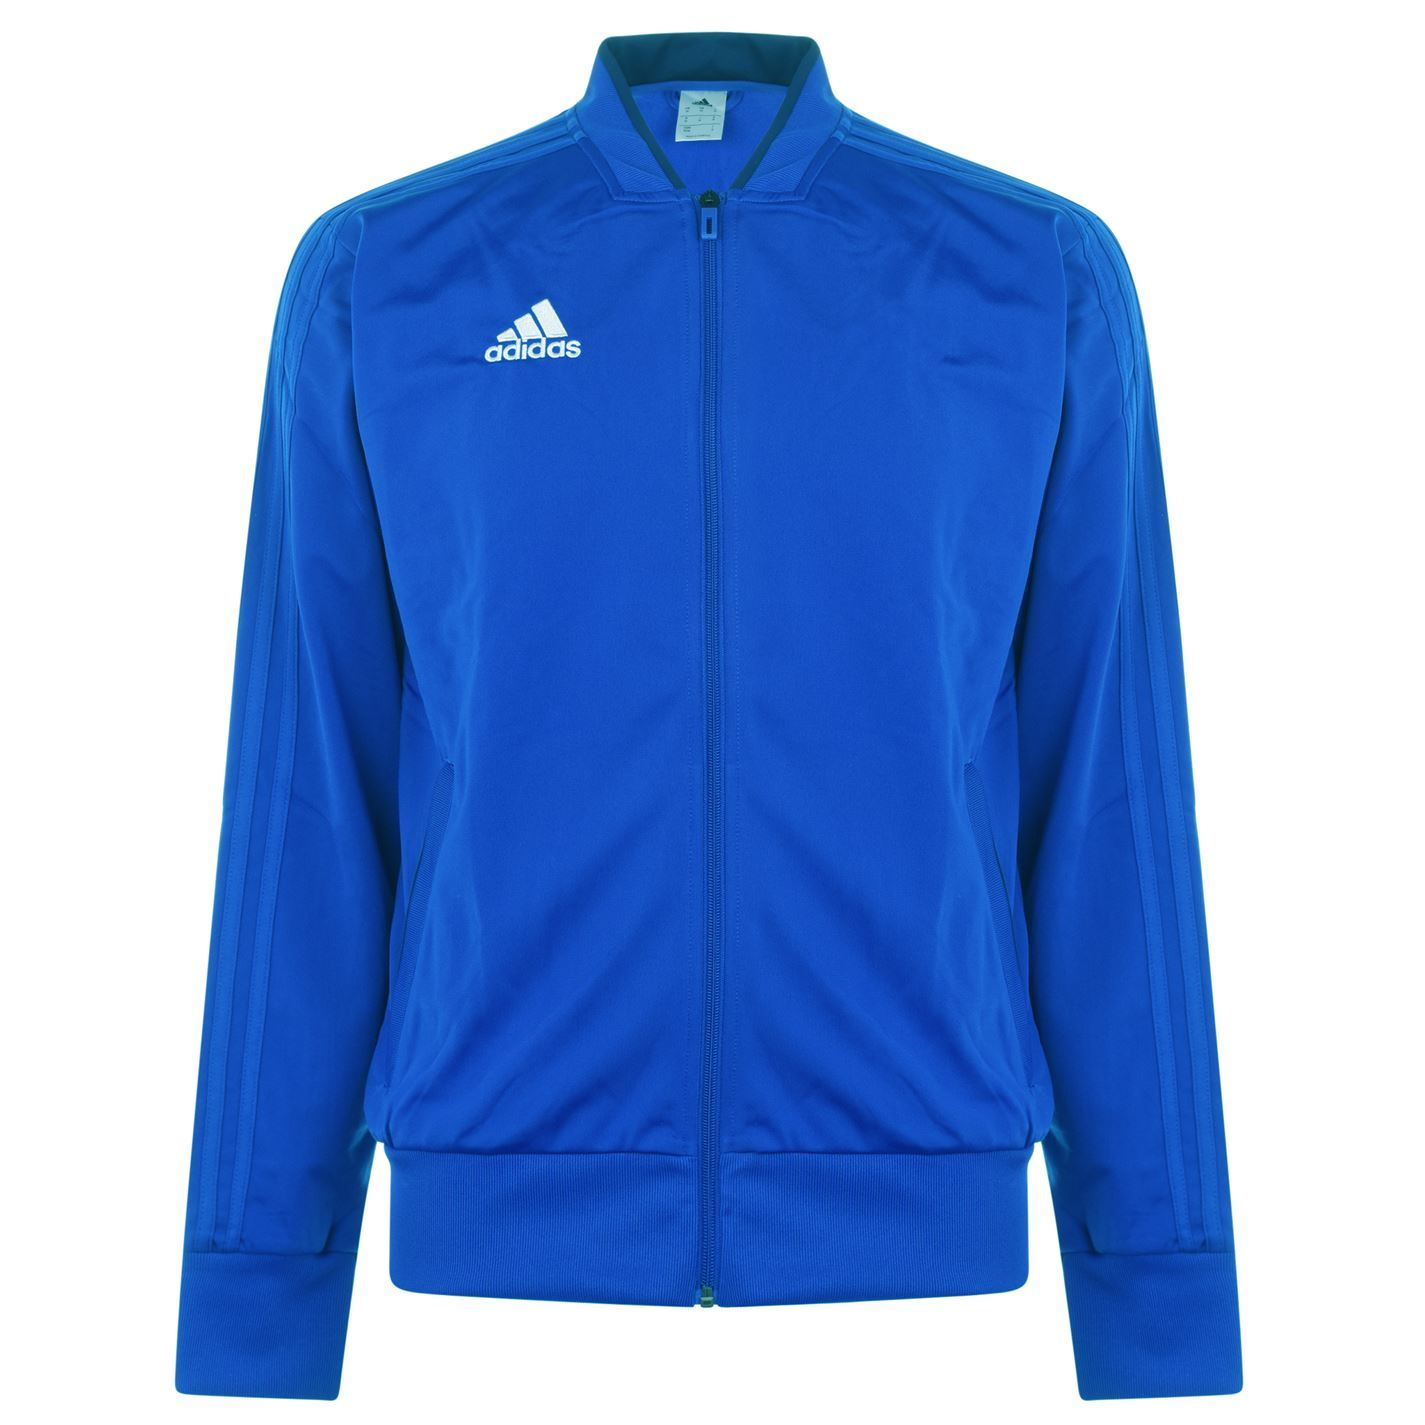 Honduras Track Jacket Royal Blue Honduras long sleeve track jacket XS-3XL